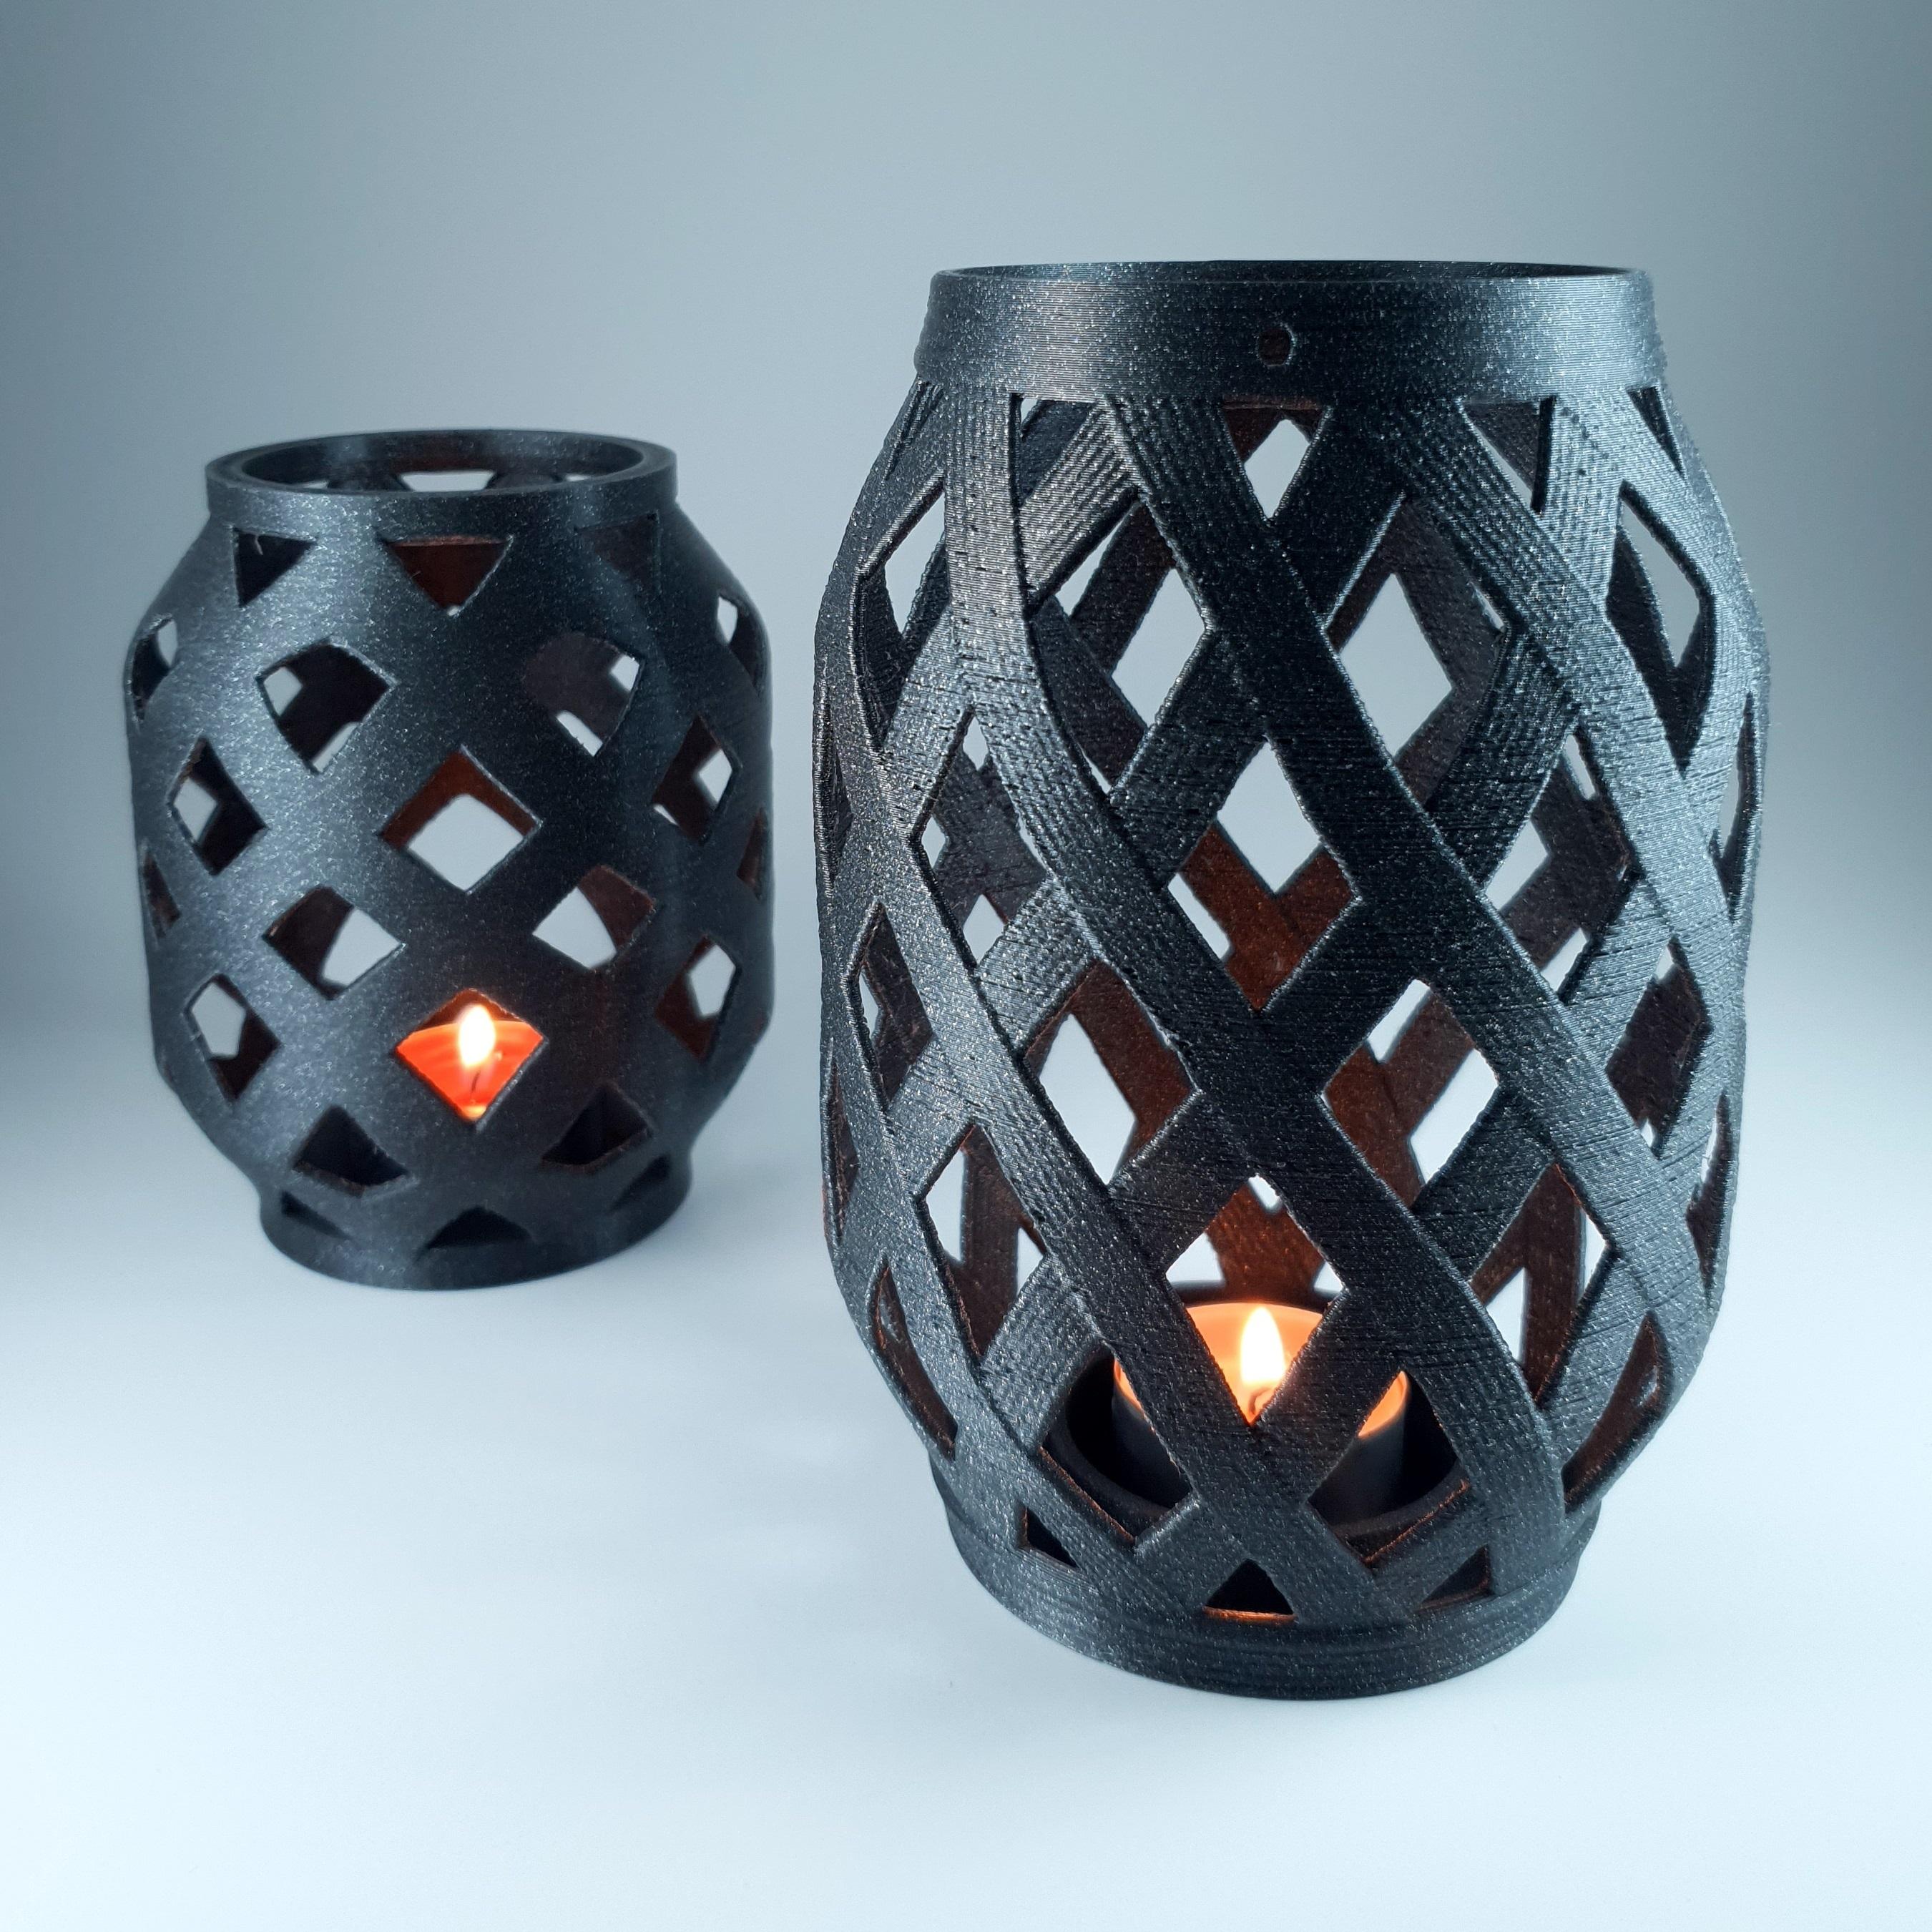 5.jpg Download free STL file Candle Lantern  • 3D printer template, 3D_Printing_Athens